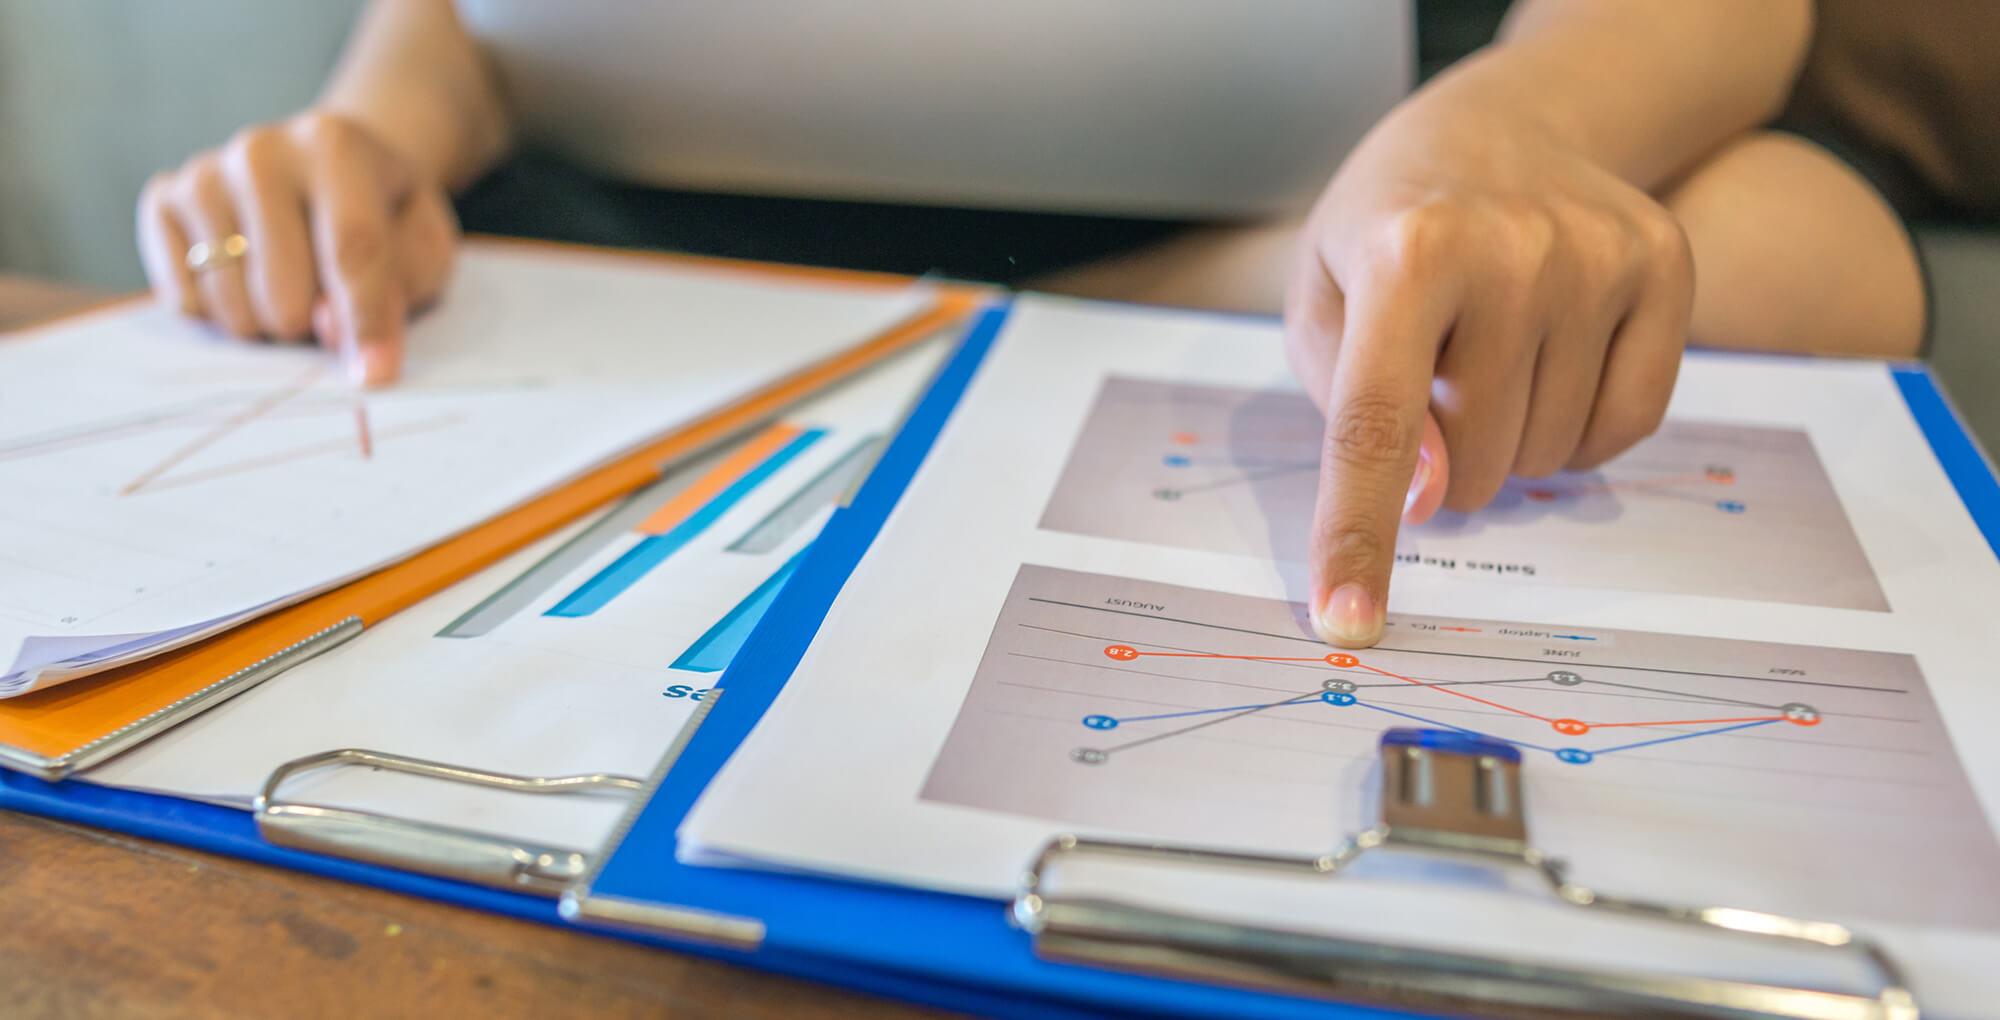 goal setting with a new digital marketing agency